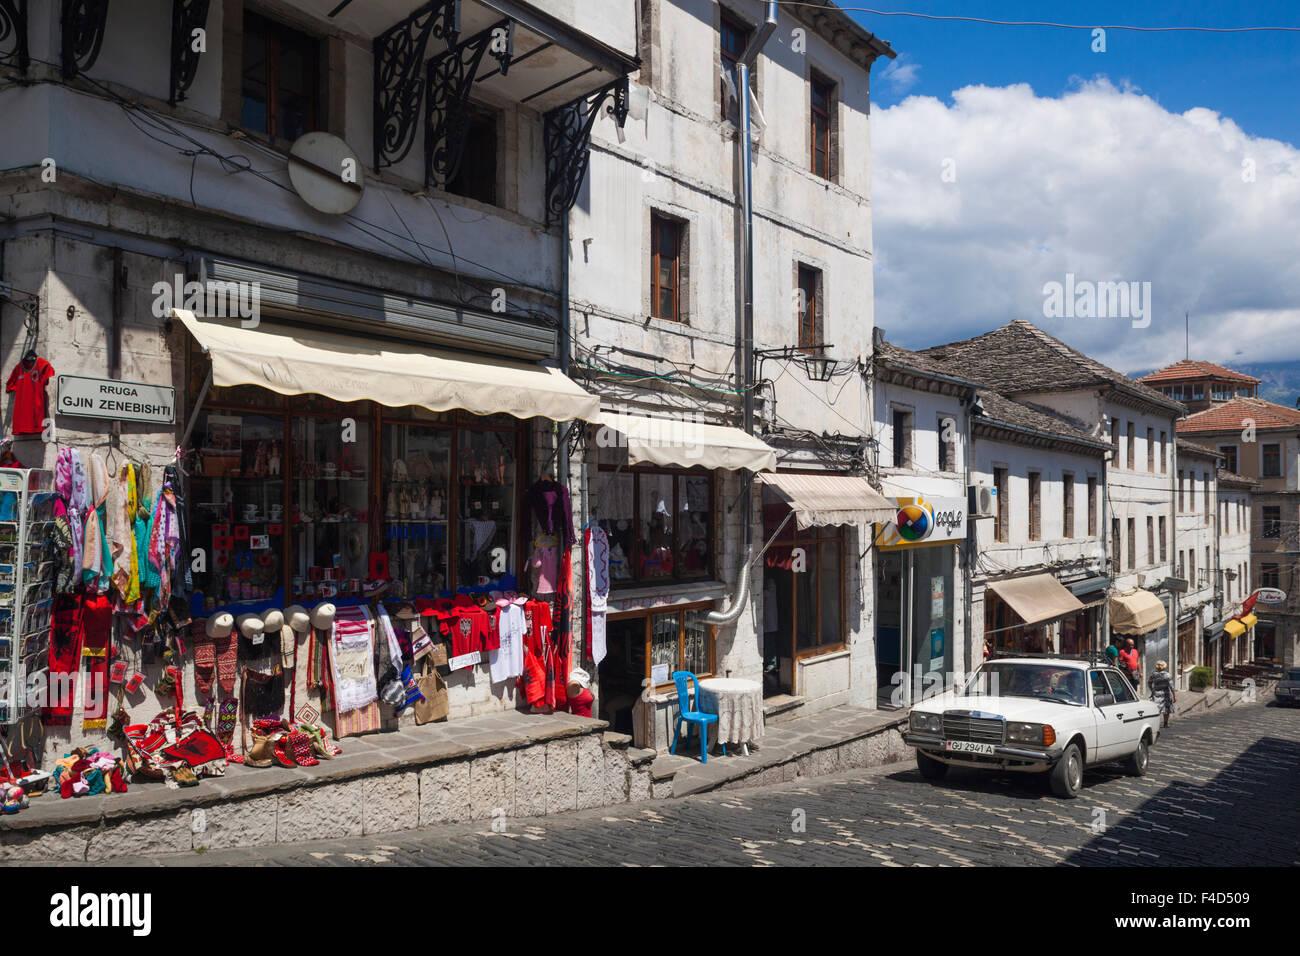 Albania, Gjirokastra, Ottoman town buildings - Stock Image